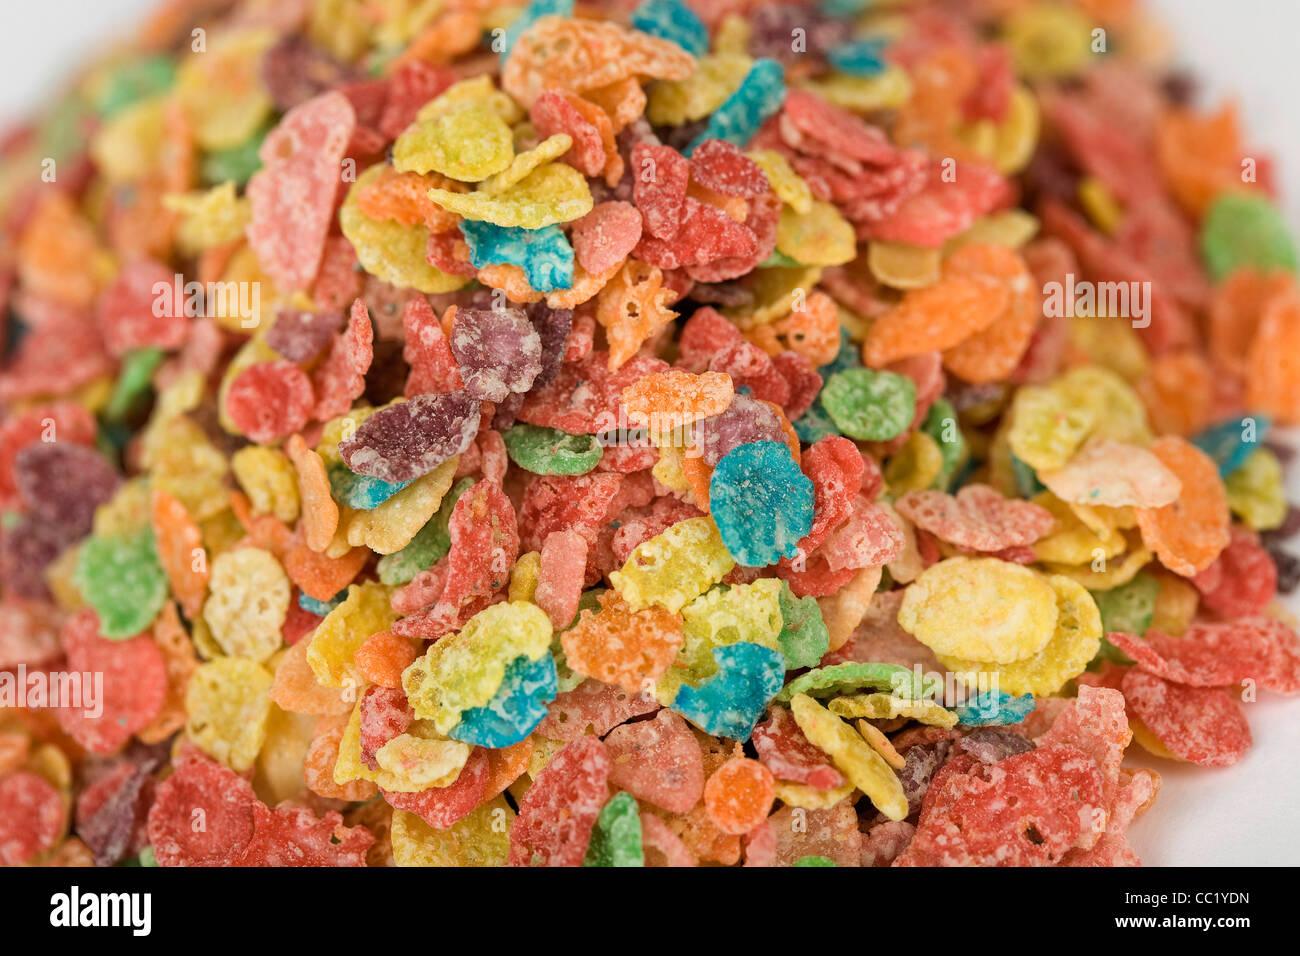 Fruchtige Kiesel-Frühstücks-Cerealien. Stockbild